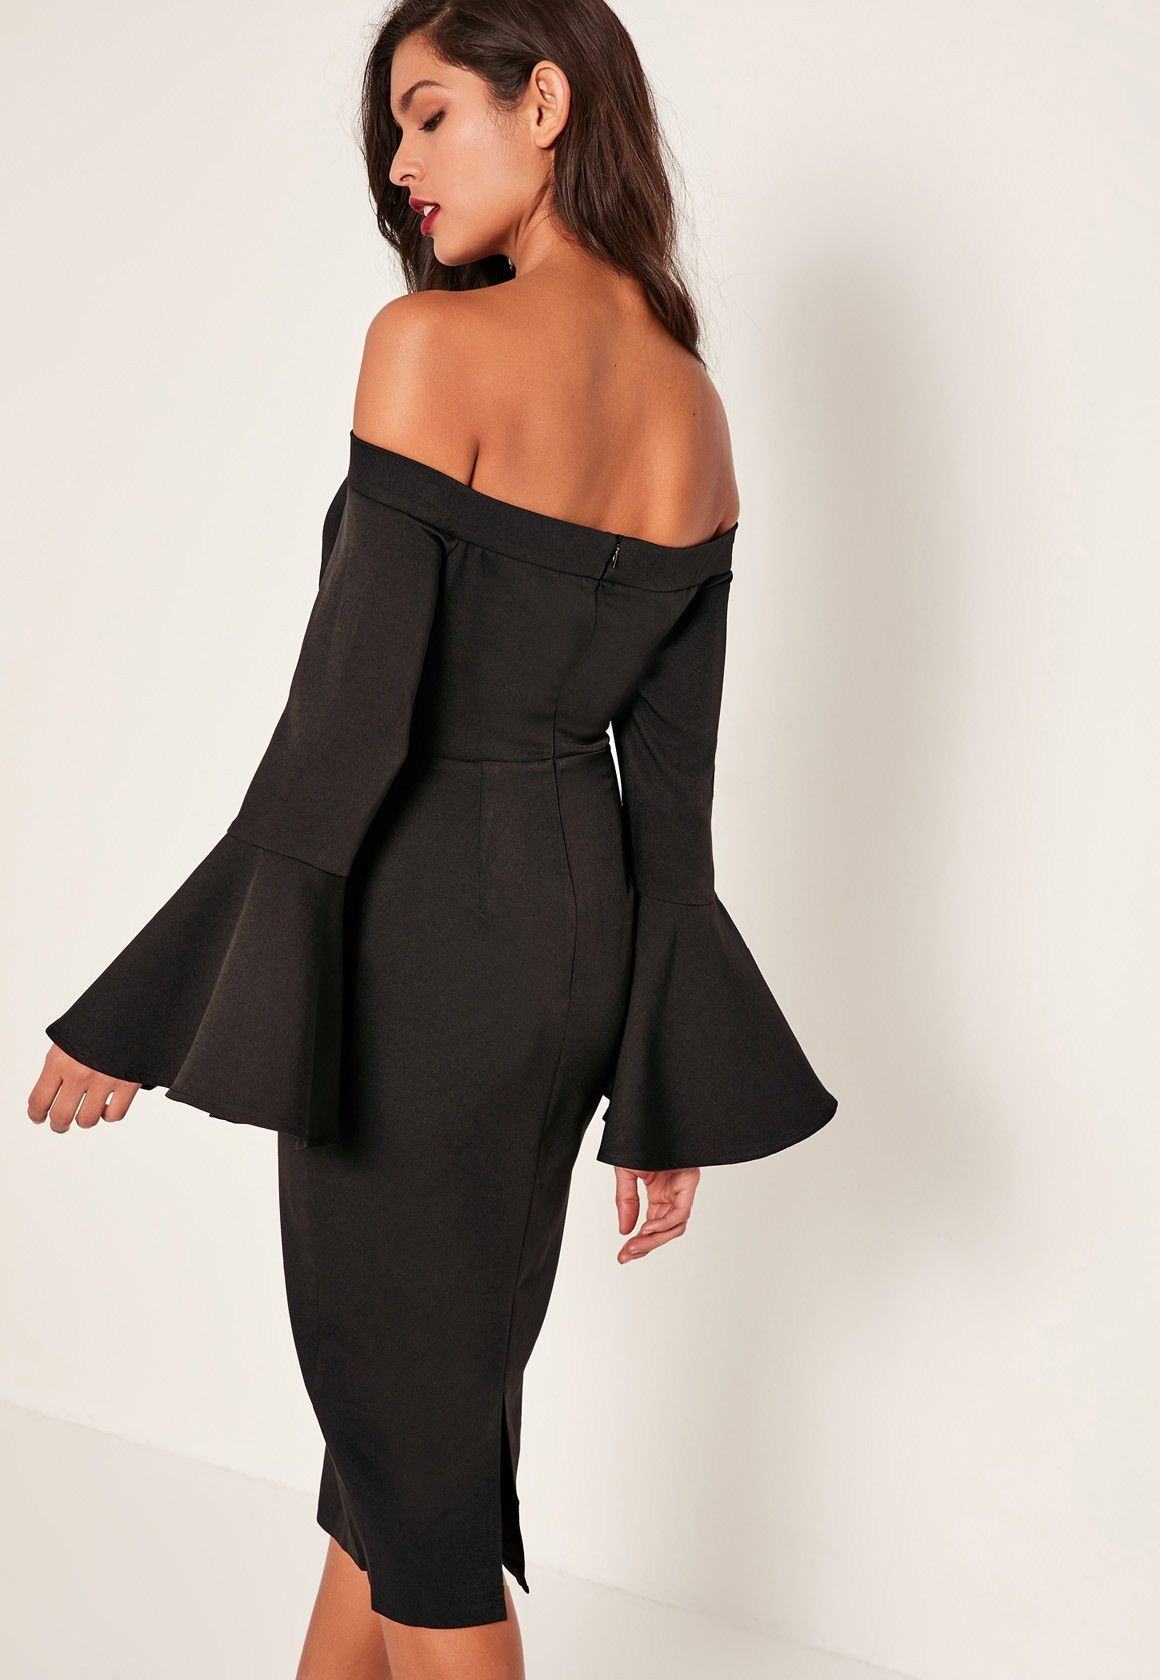 4b12ba82b702 Missguided - Black Bardot Frill Sleeve Tailored Midi Dress | Fashion ...